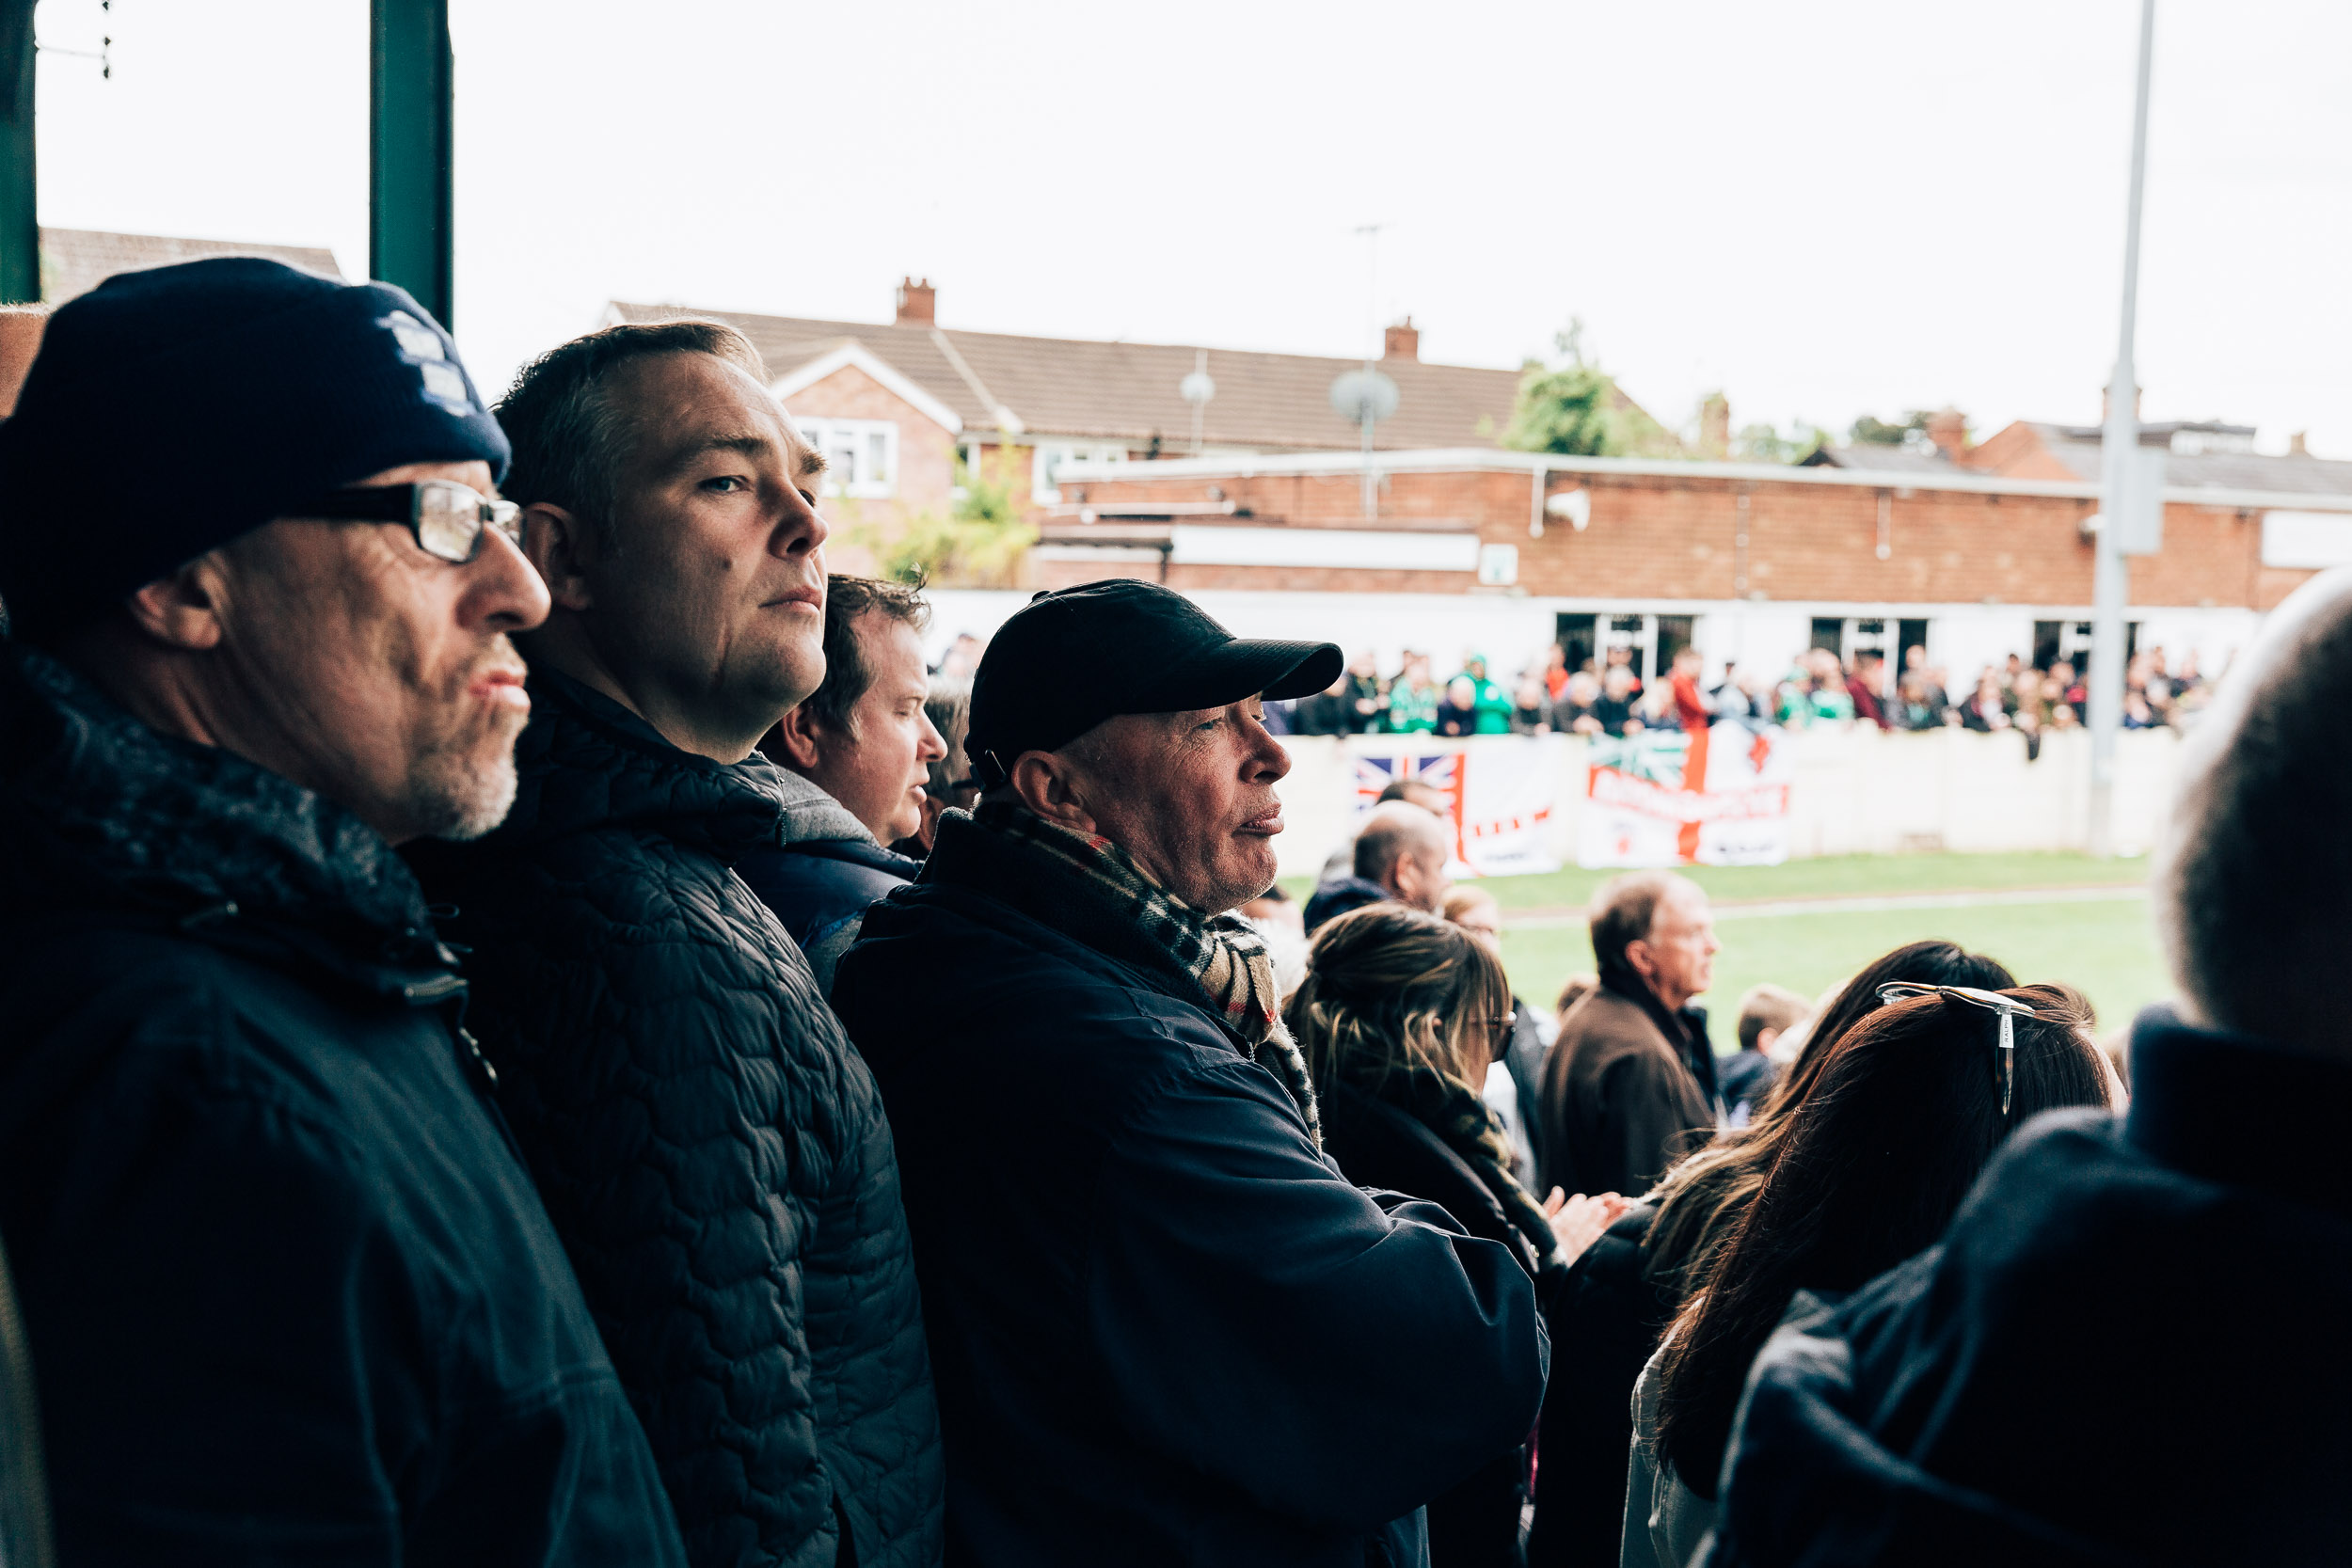 06_05_2019_Bromsgrove_Sporting_Corby-56.jpg